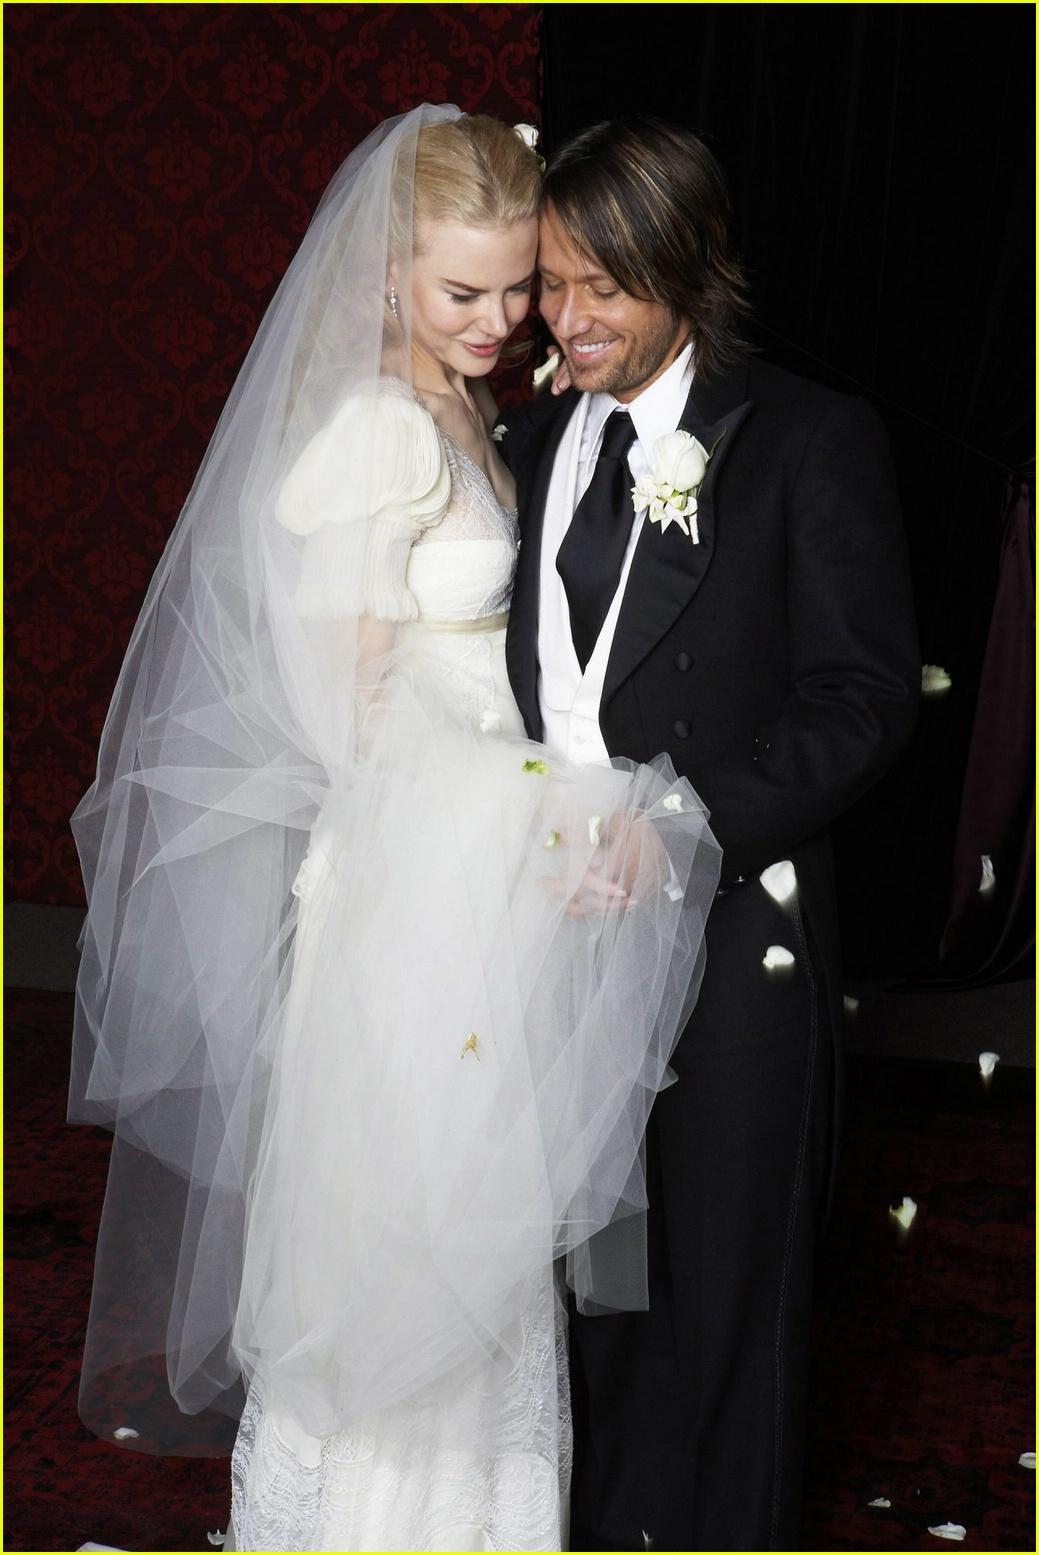 http://3.bp.blogspot.com/_GzUktcYBsD8/TClDMUpaoRI/AAAAAAAAlBI/XQ7ju3xWoqc/s1600/nicole-kidman-wedding-pictures20.jpg